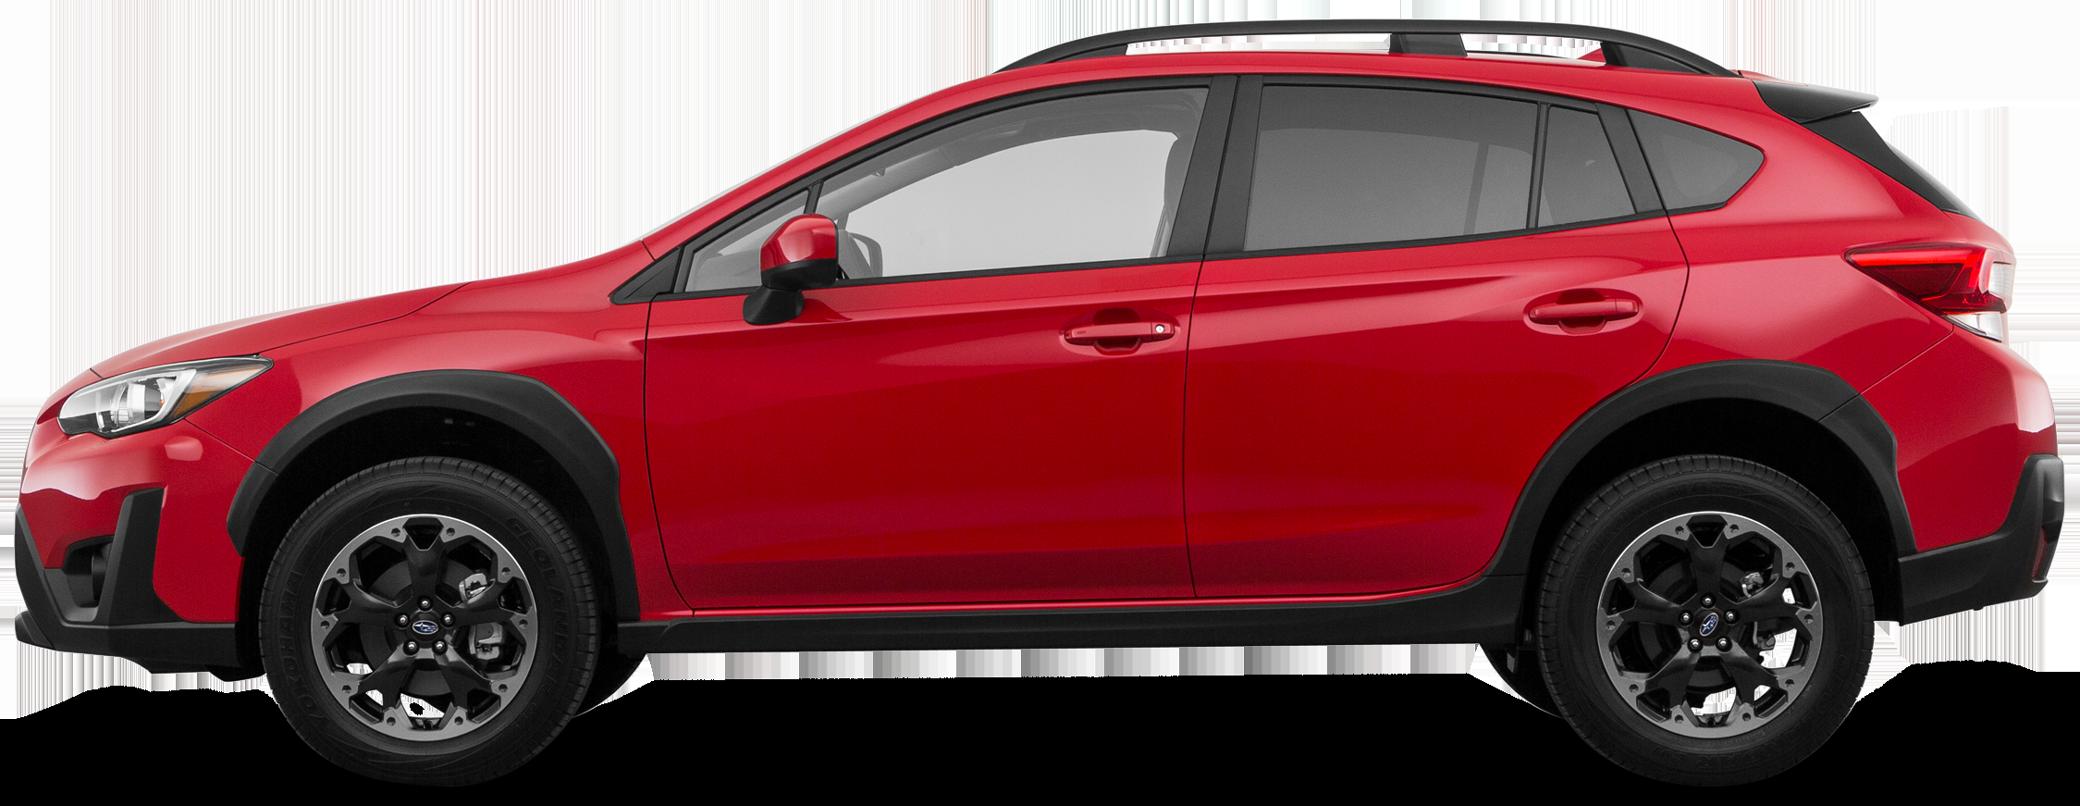 2021 Subaru Crosstrek VUS Tourisme